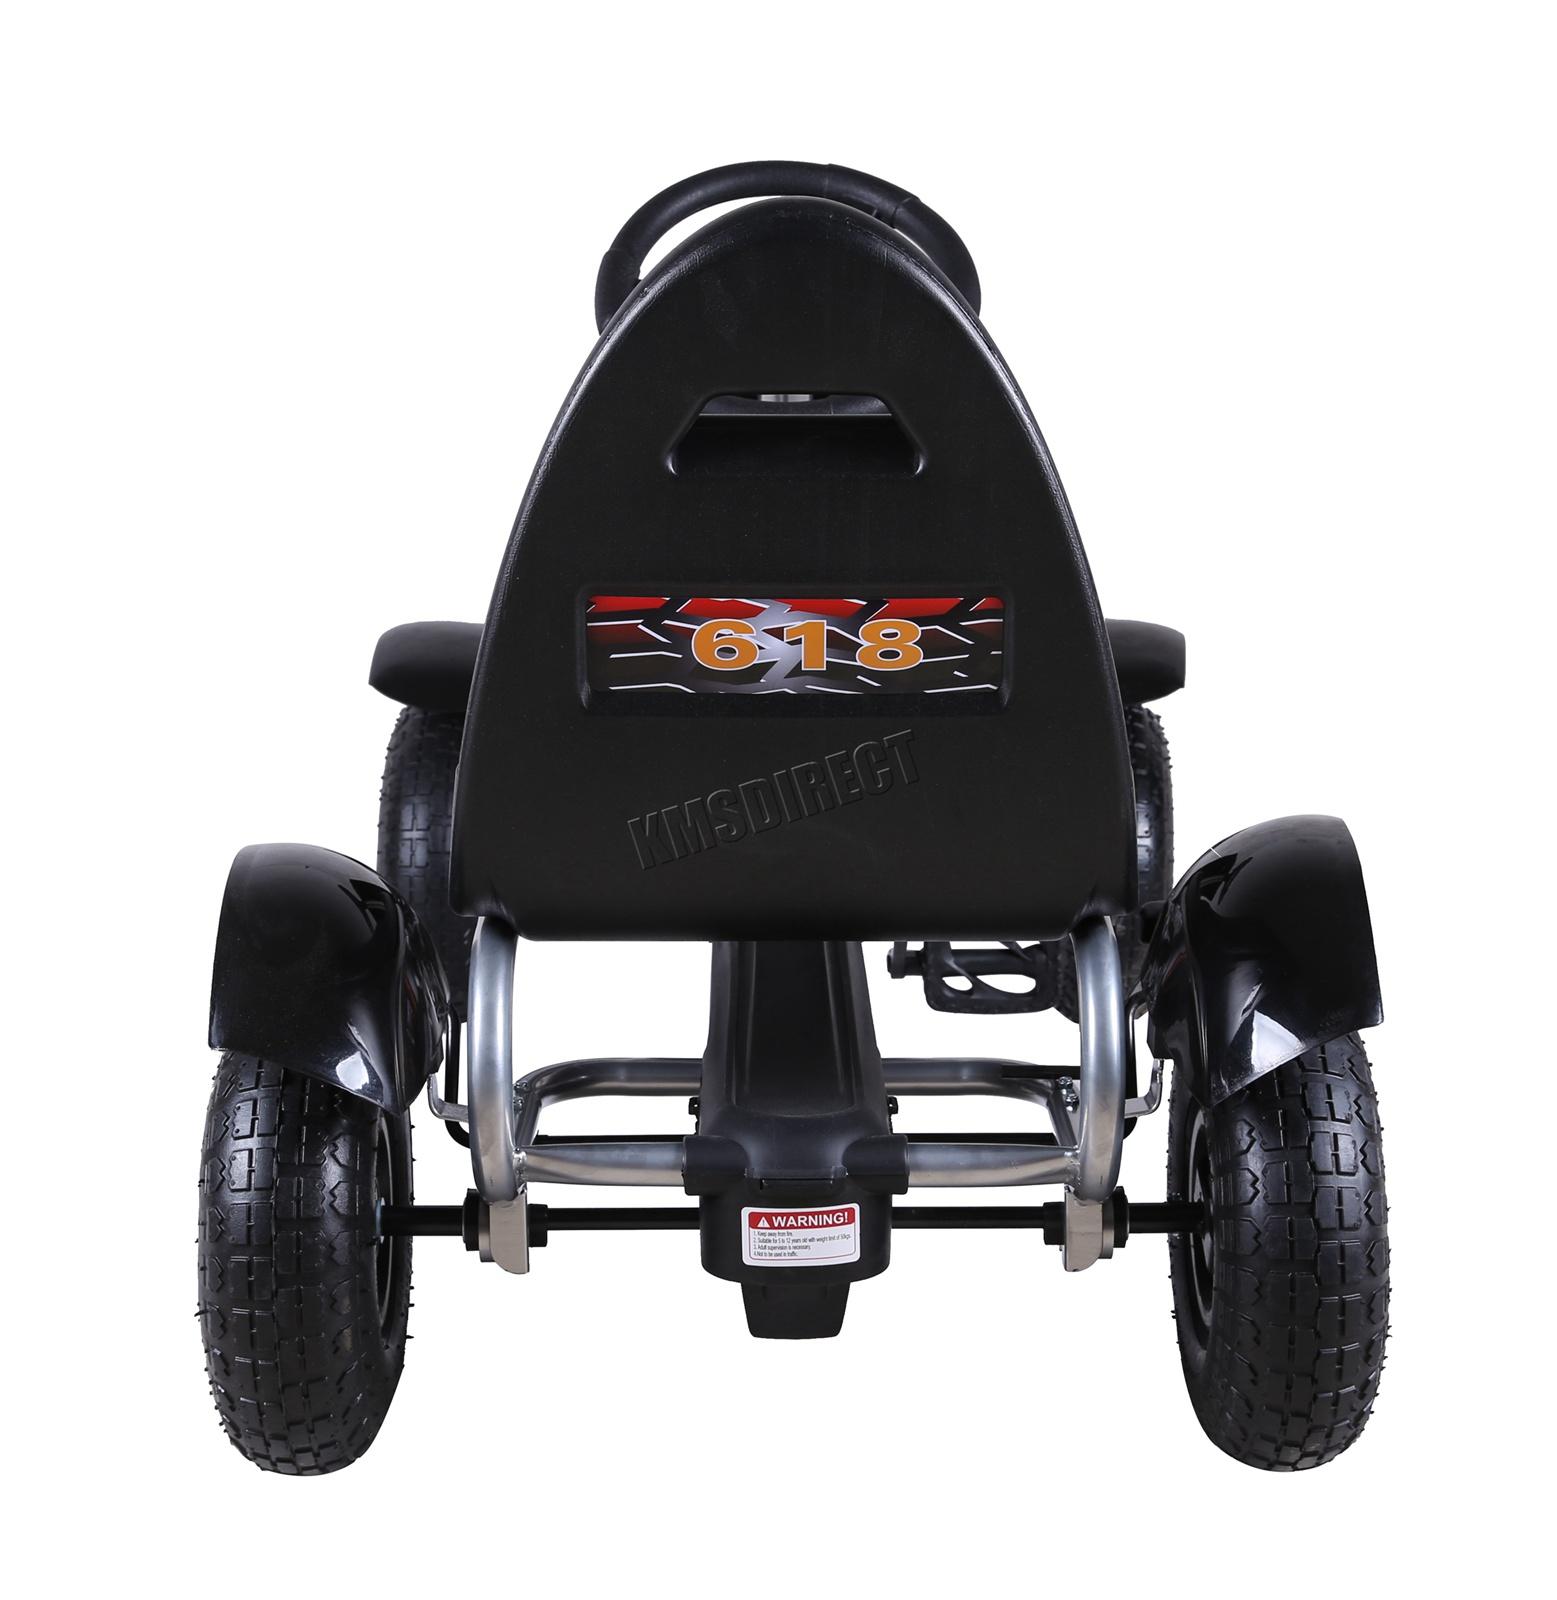 201701719267 2475 I 305 25 GOKART FH G03 BLACK KMSWM077 - Foxhunter Infantil Go Kart – Pedal Coche para Niños Gocart con Freno de Mano G03